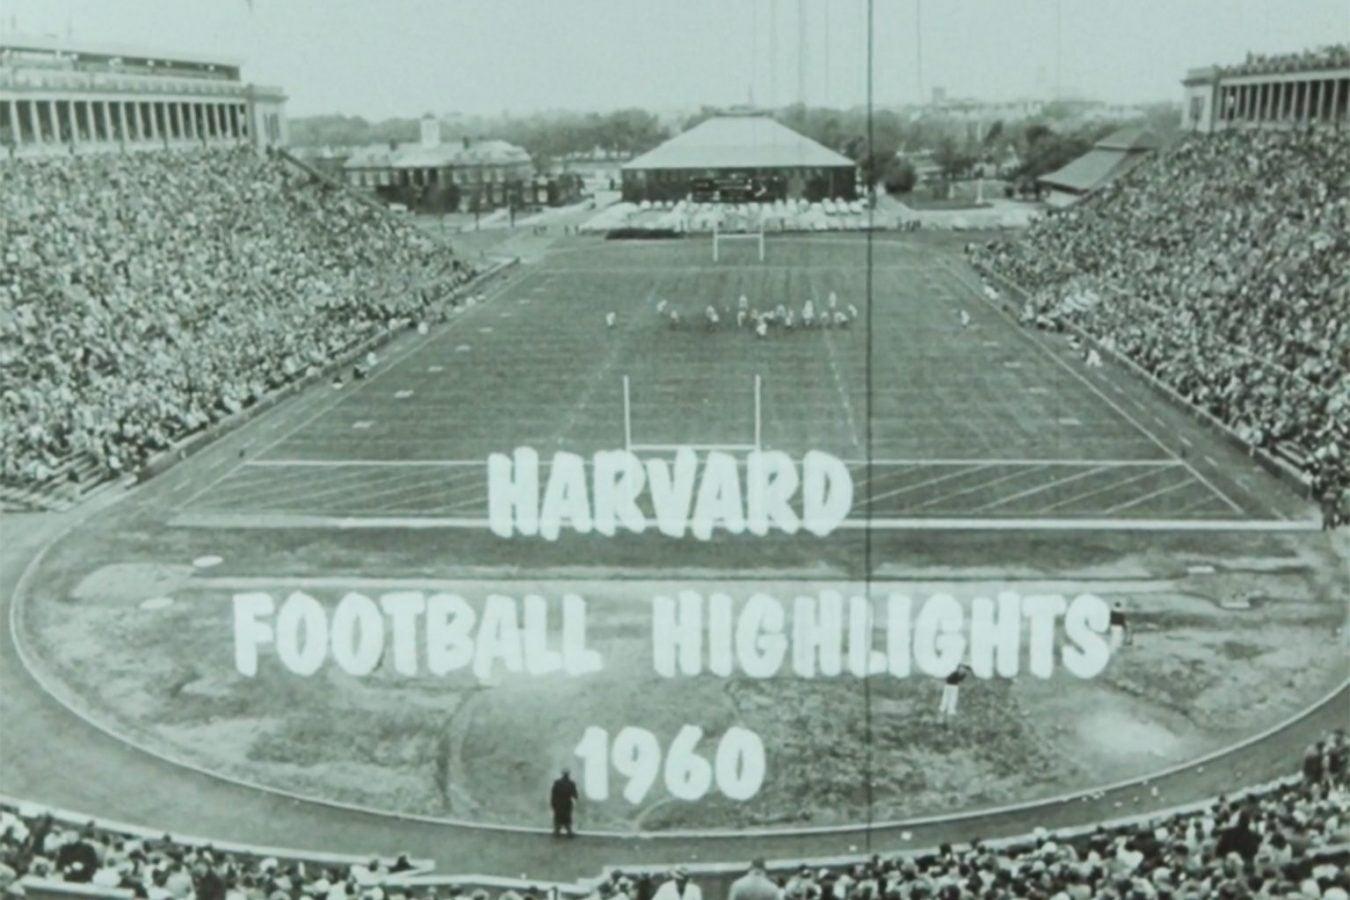 a black and white still of the Harvard stadium.